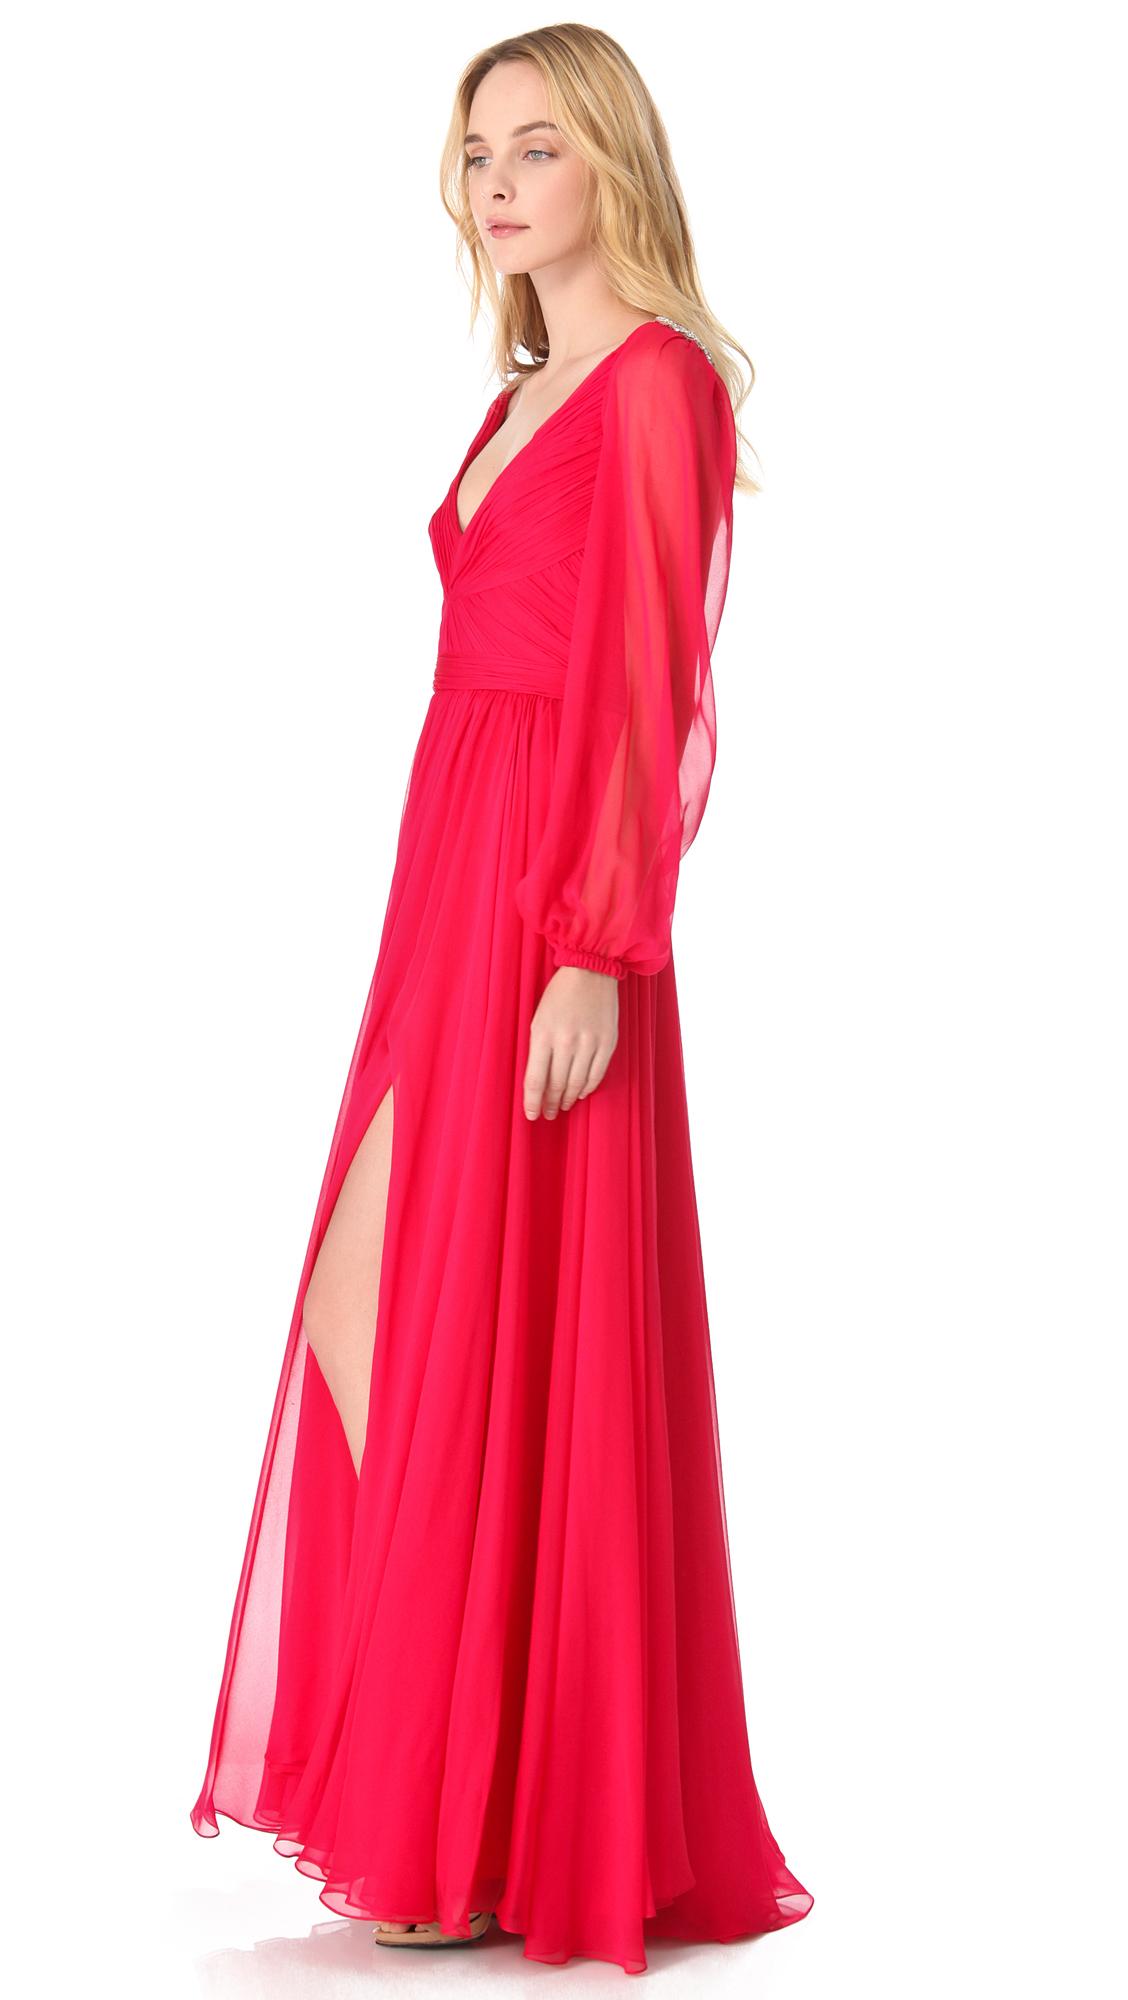 Lyst - Reem Acra Flowing Bell Sleeve Dress in Red